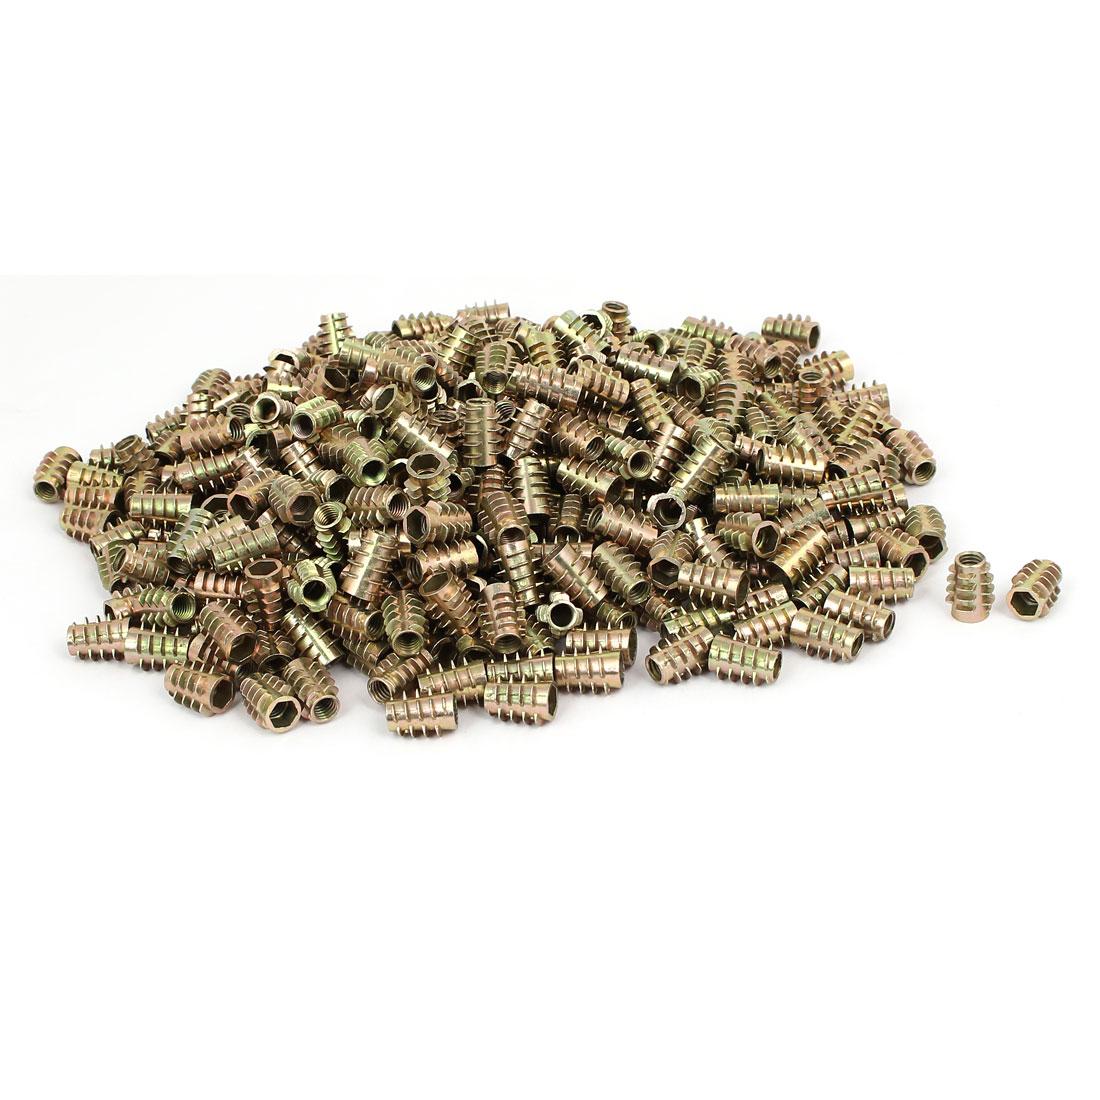 Wood Furniture Zinc Alloy Hex Socket Insert Screws E-Nuts M6x15mm 500pcs